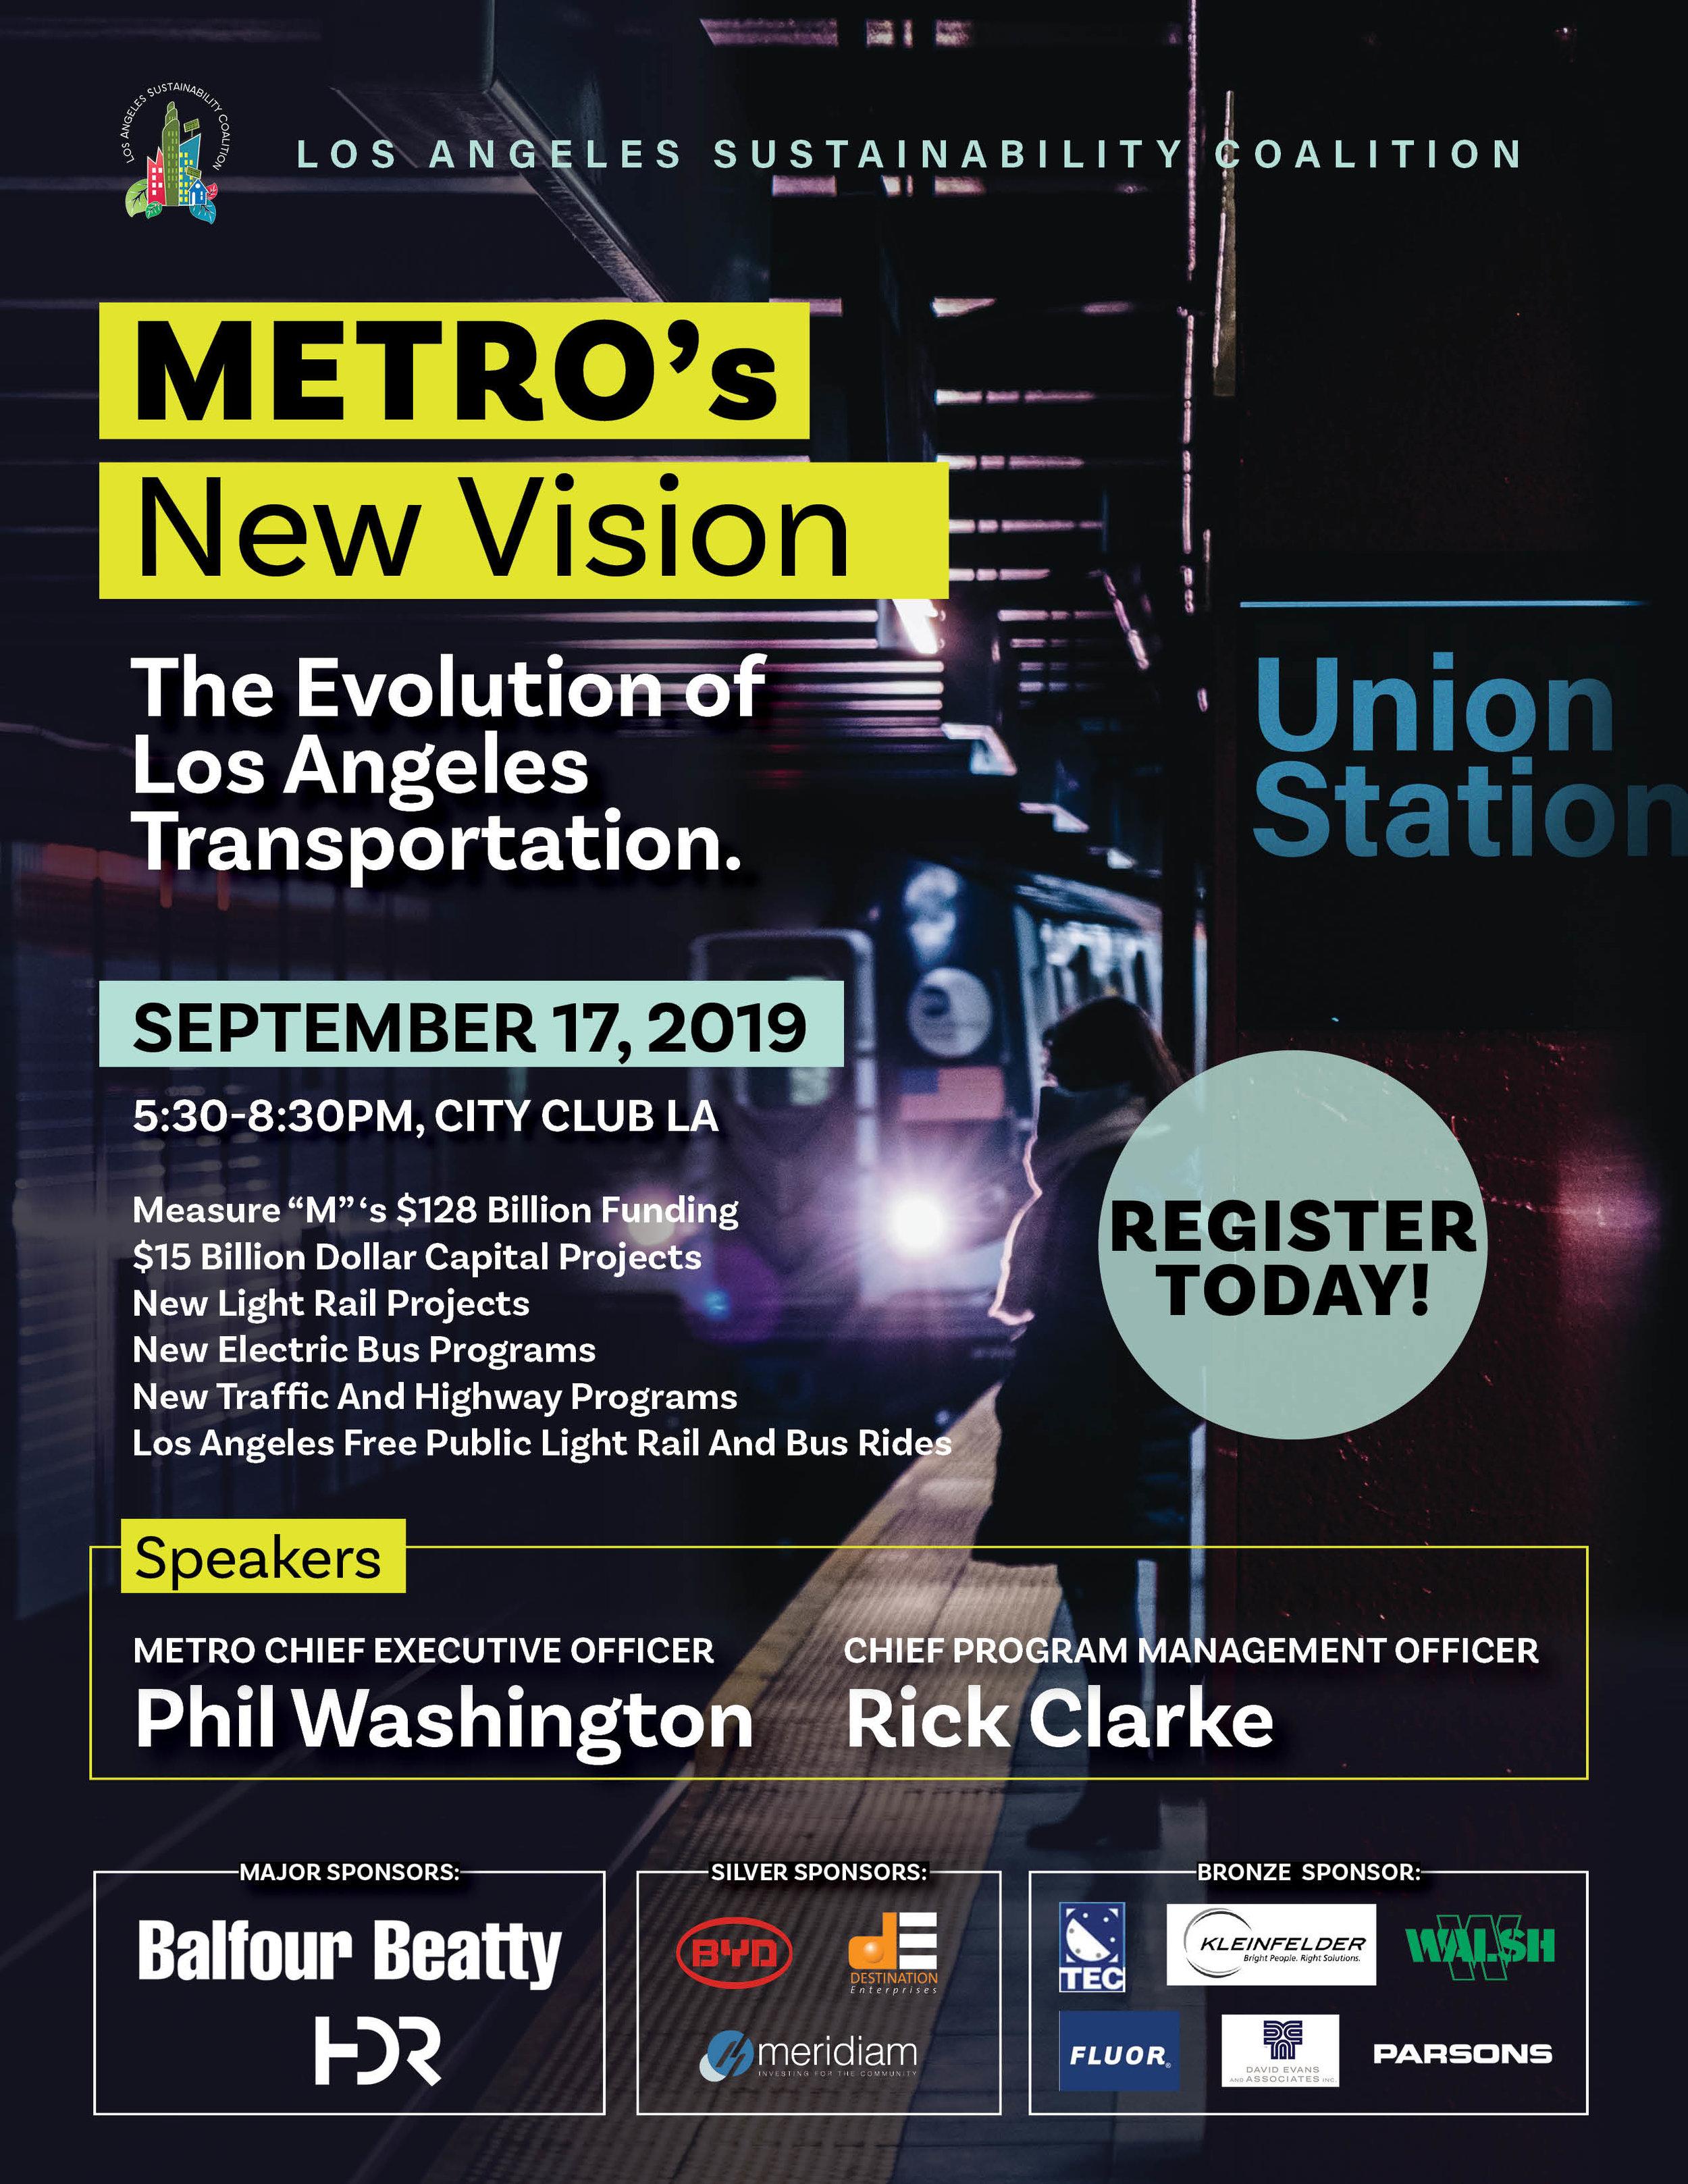 091719 - Metros New Vision-071819.jpg